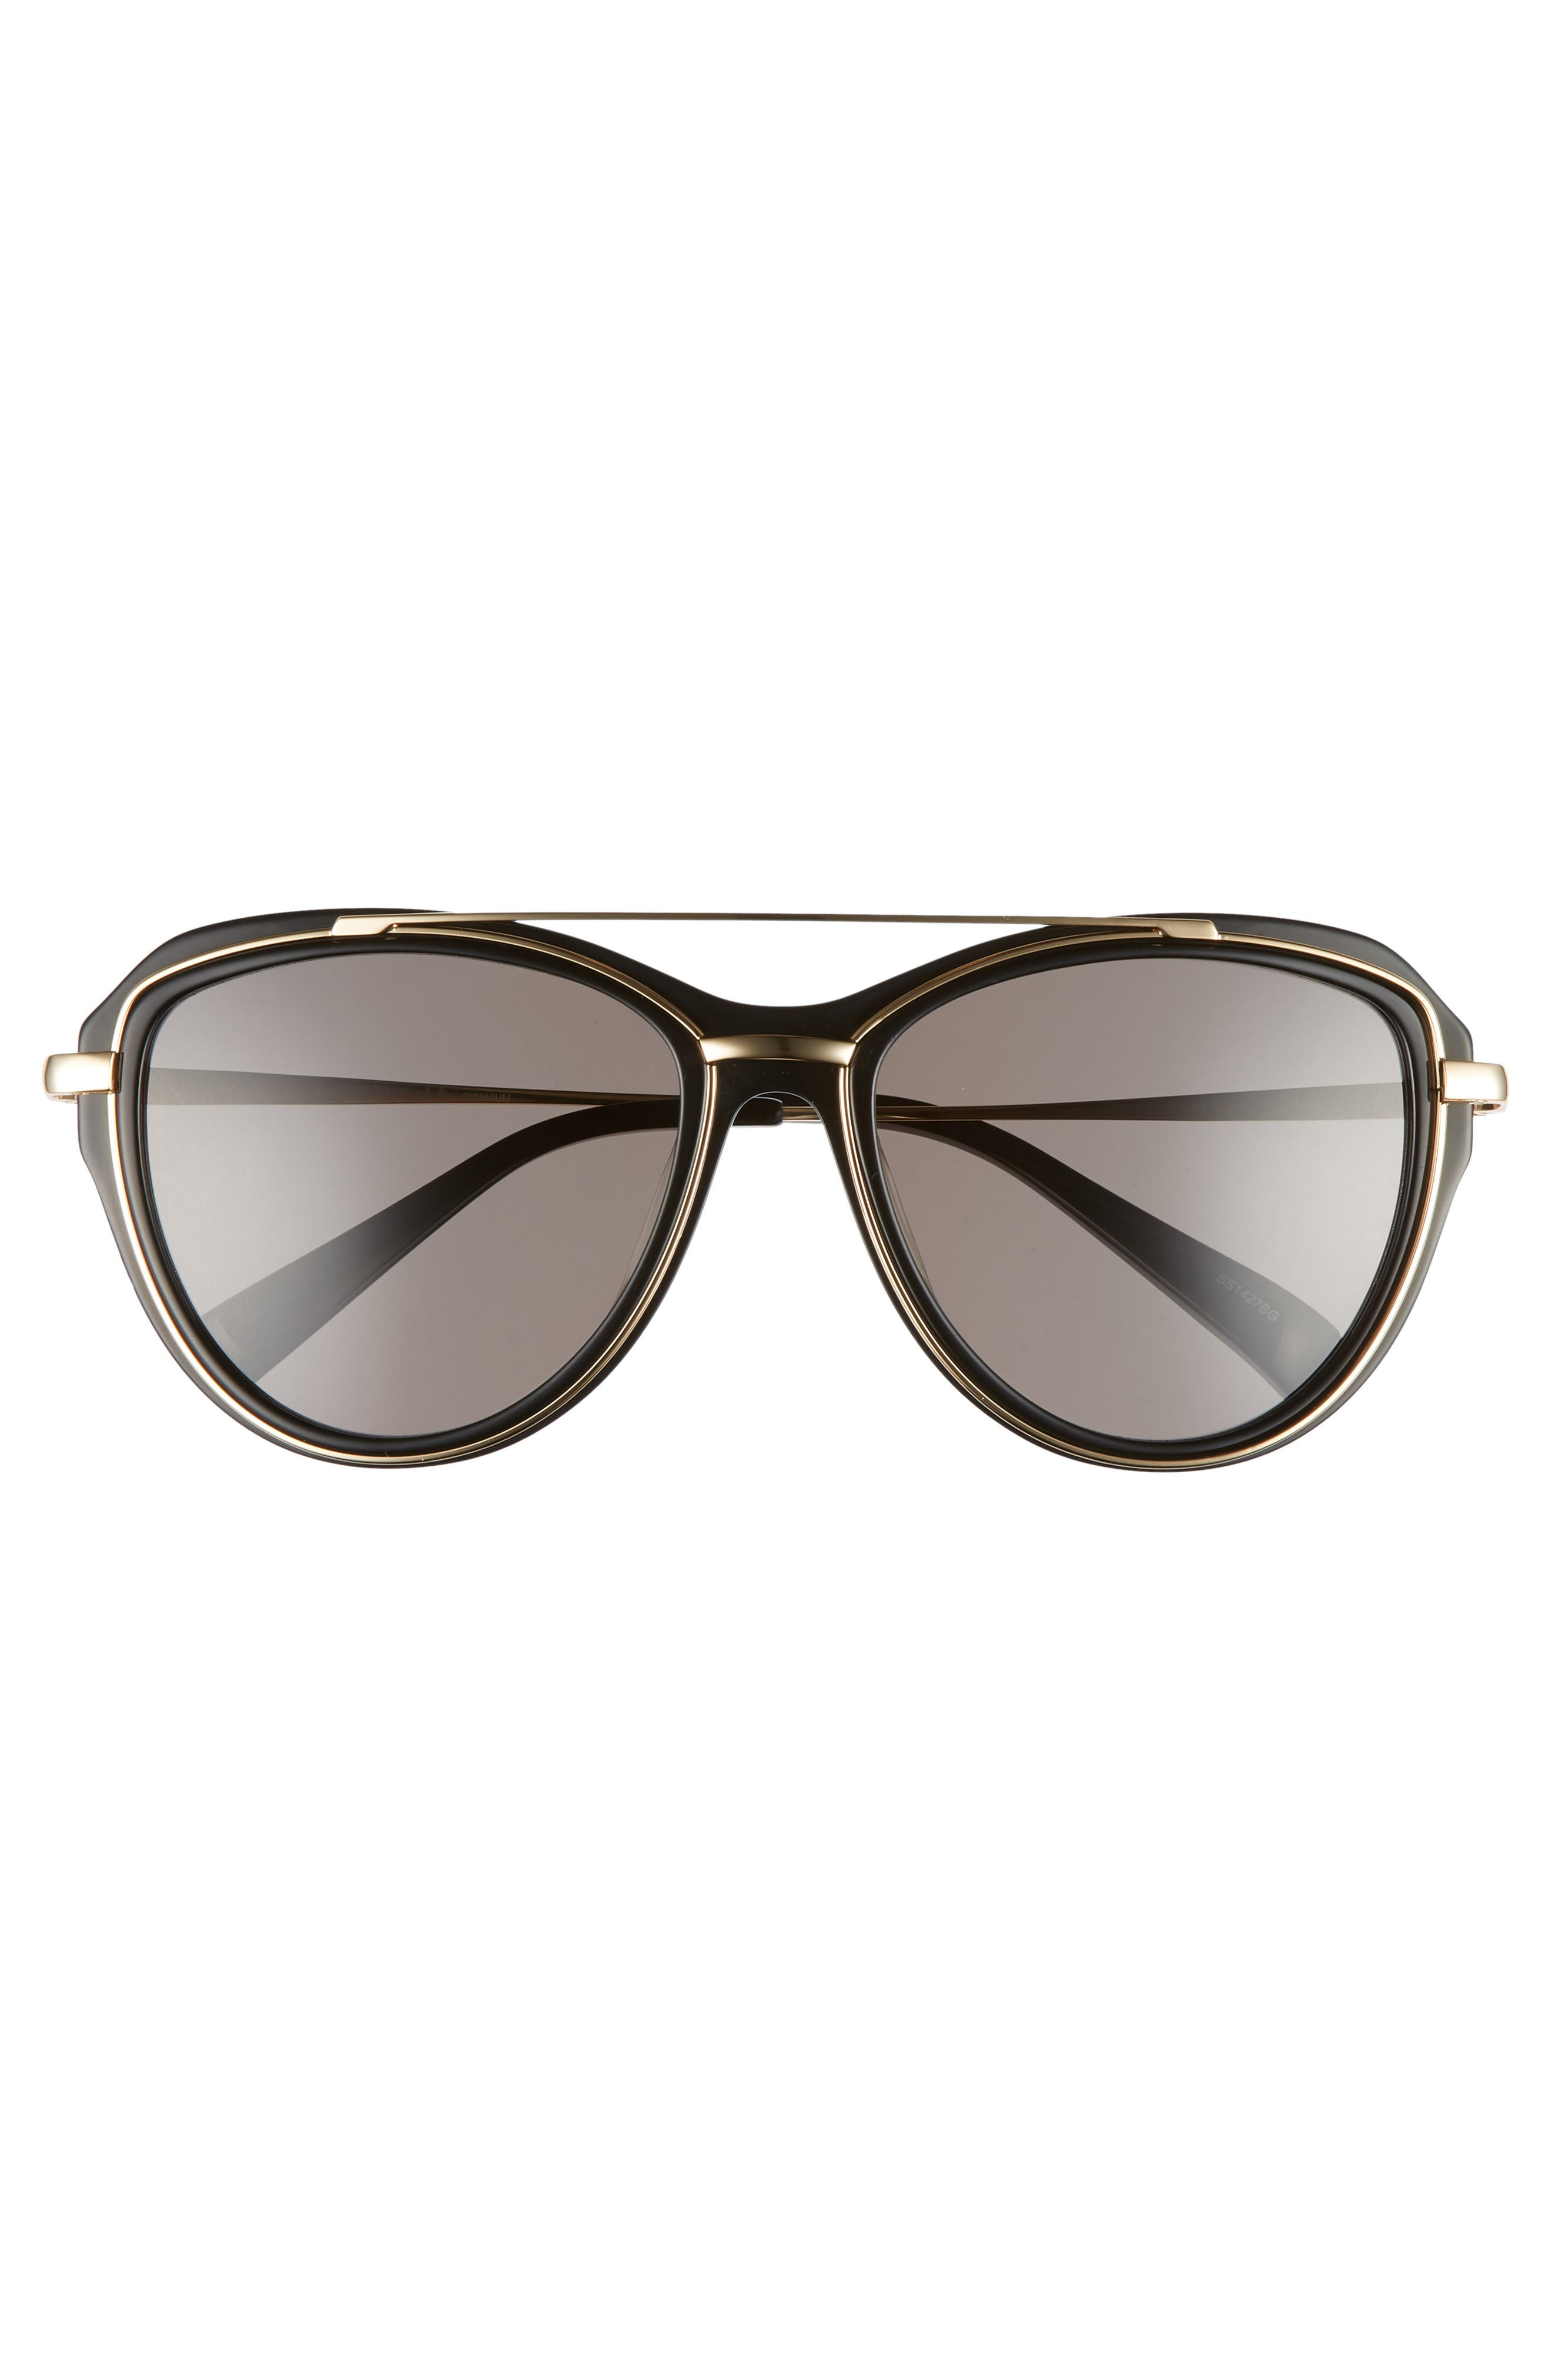 BLANC & ECLARE Marrakesh 57mm Aviator Sunglasses,                             Alternate thumbnail 3, color,                             001